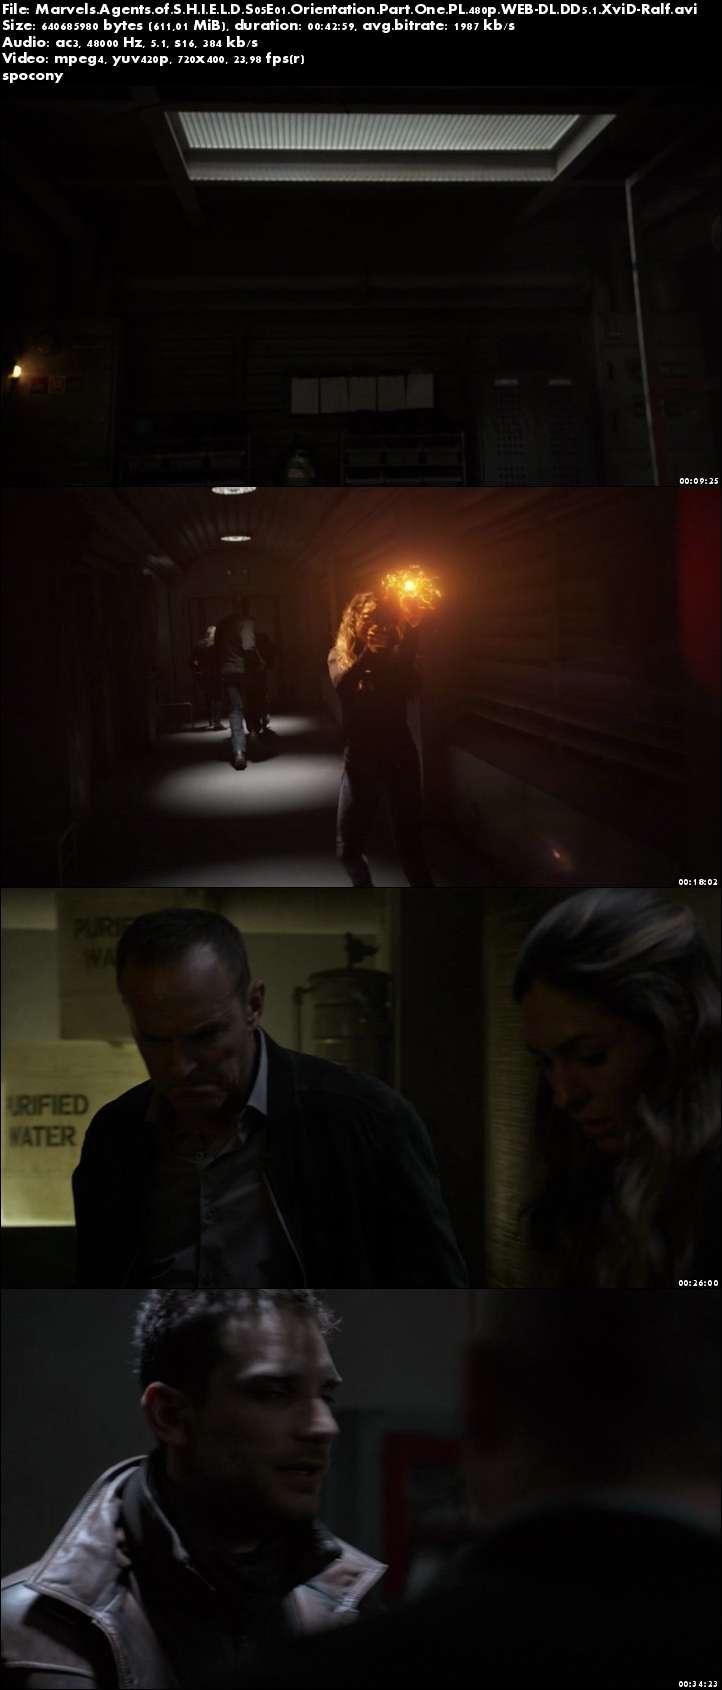 Agenci T.A.R.C.Z.Y. / Marvel's Agenci T.A.R.C.Z.Y. / Marvel's Agents of S.H.I.E.L.D. (2017) {Sezon 5} (Pełen sezon) PL.480p.WEB-DL.XviD-Ralf [Lektor PL]